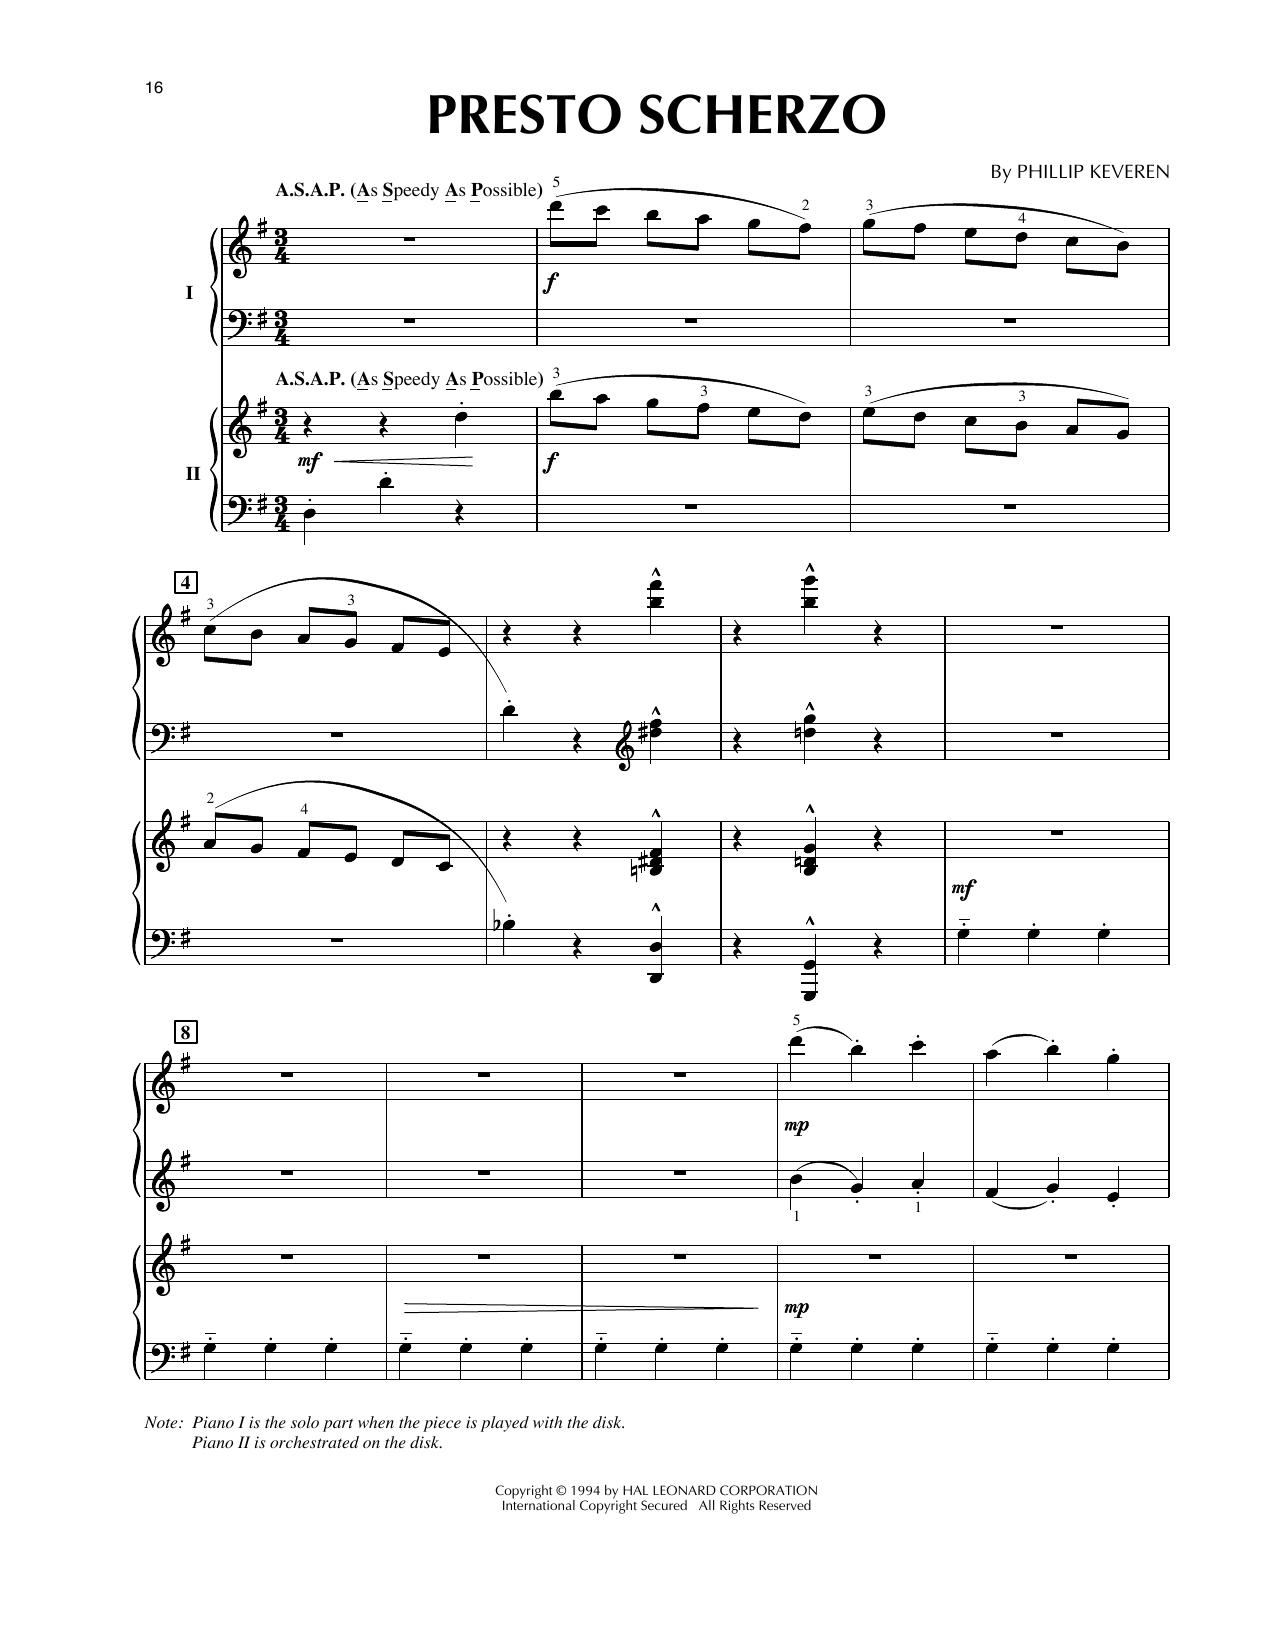 Phillip Keveren Presto Scherzo (from Presto Scherzo) (for 2 pianos) sheet music notes and chords